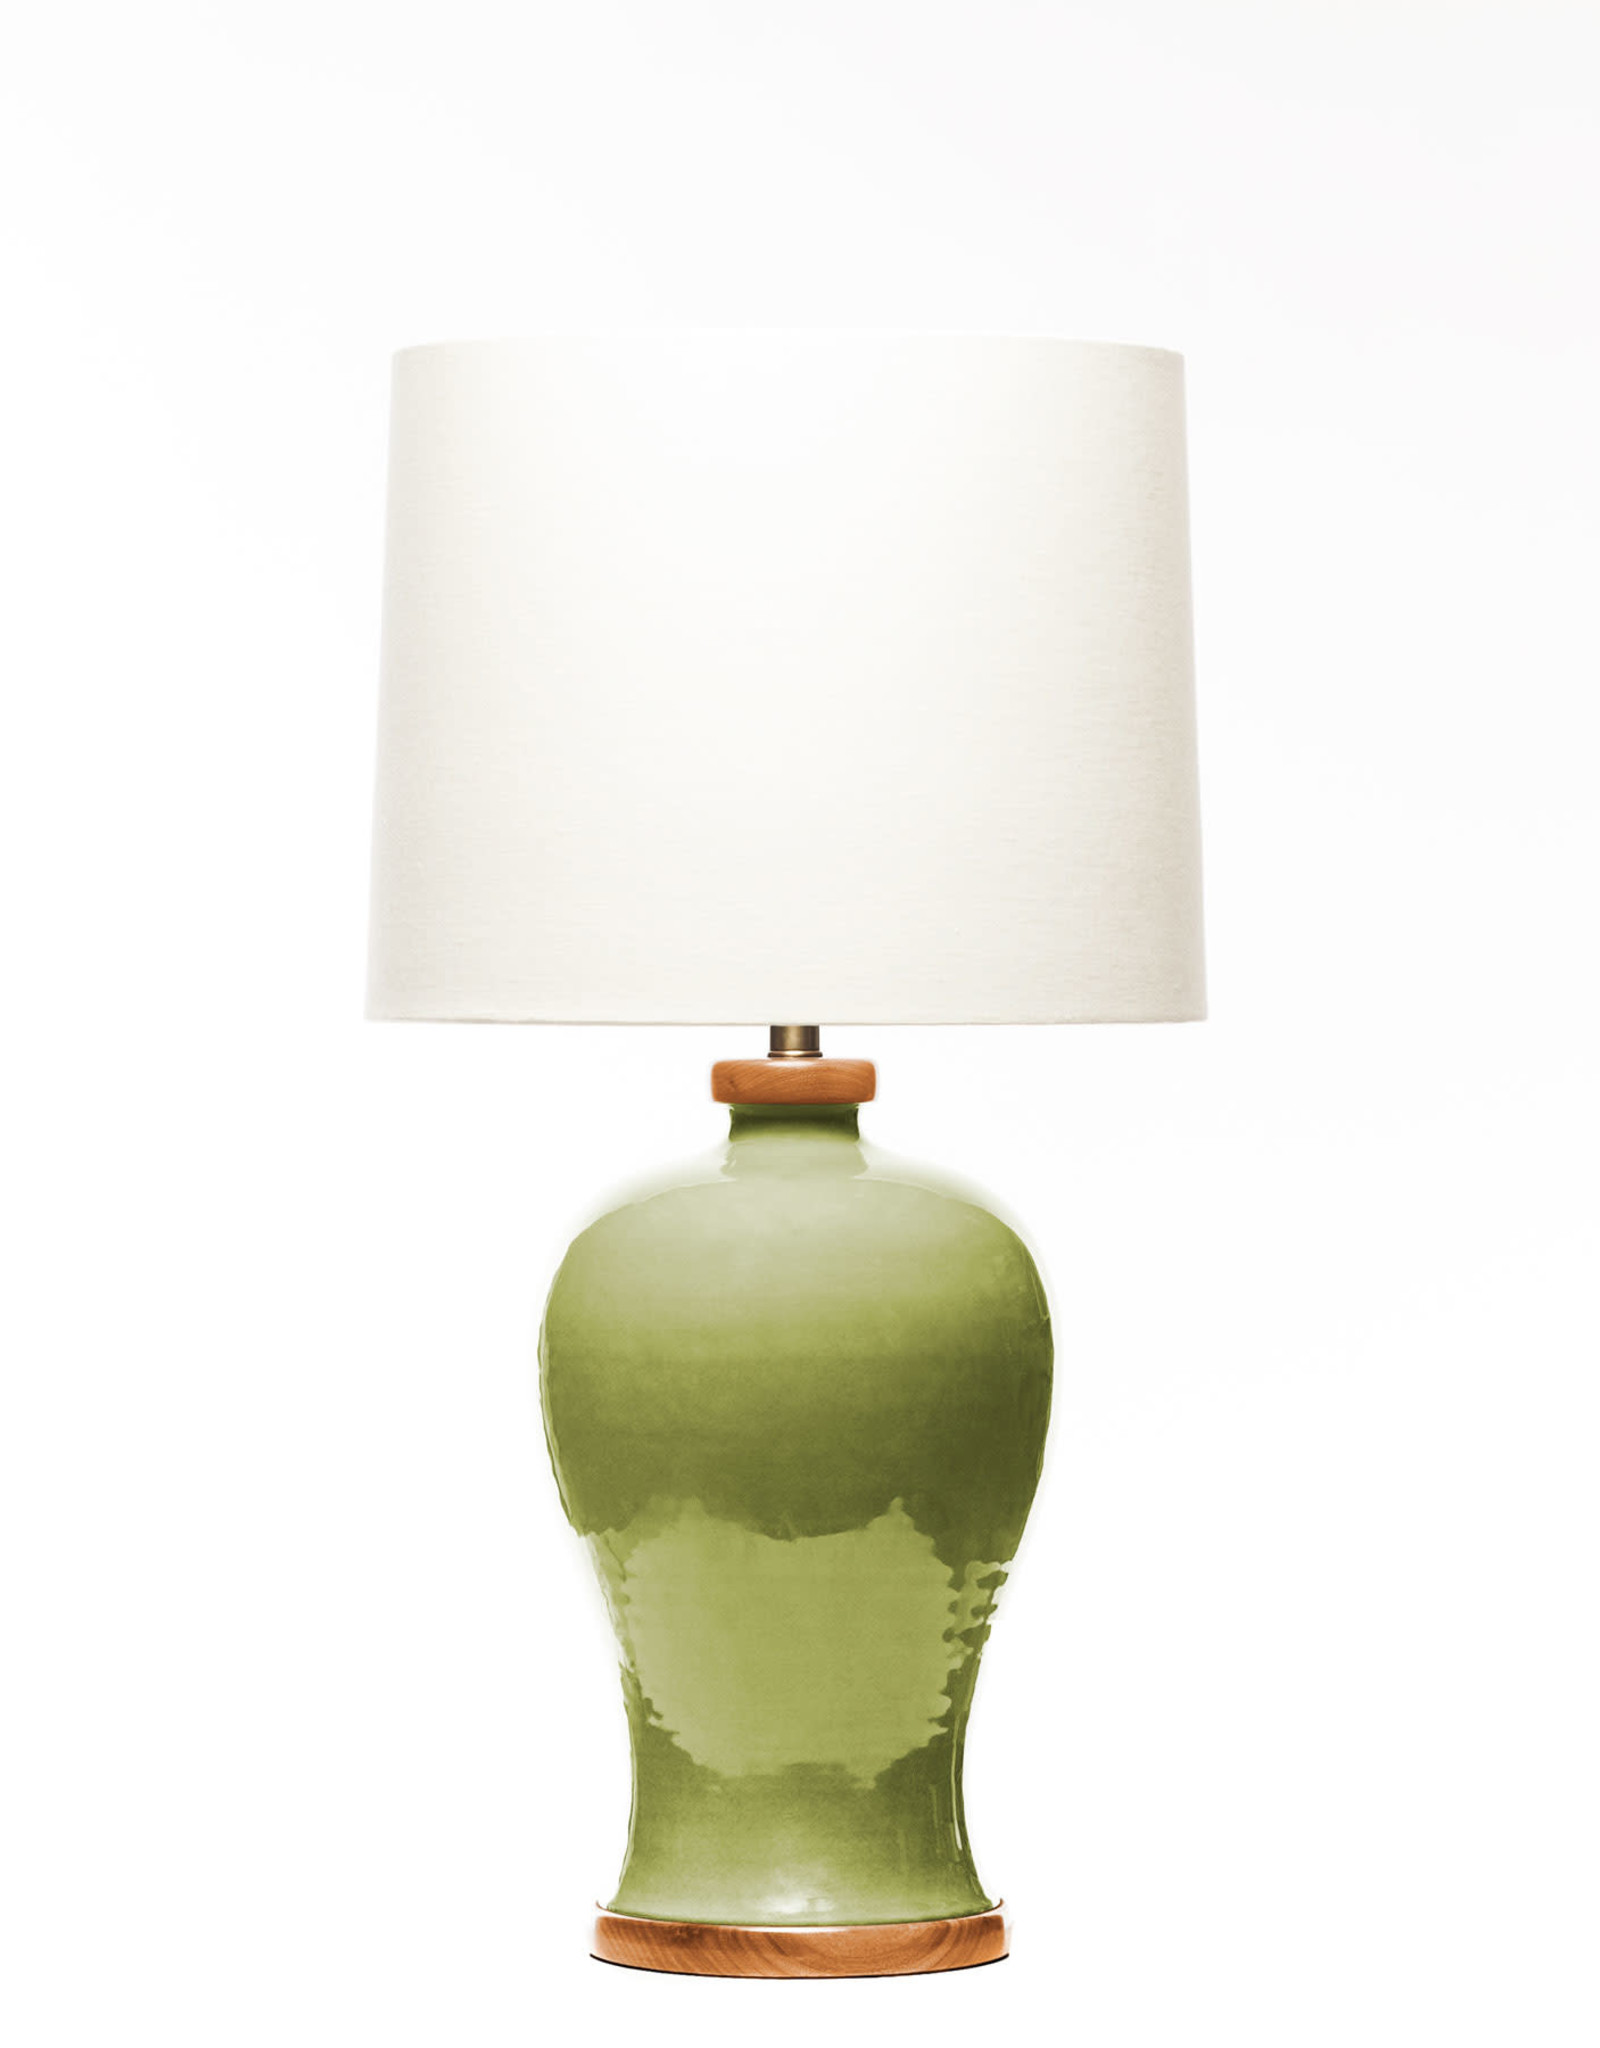 Lawrence & Scott Dashiell Table Lamp in Celadon (Sapele)